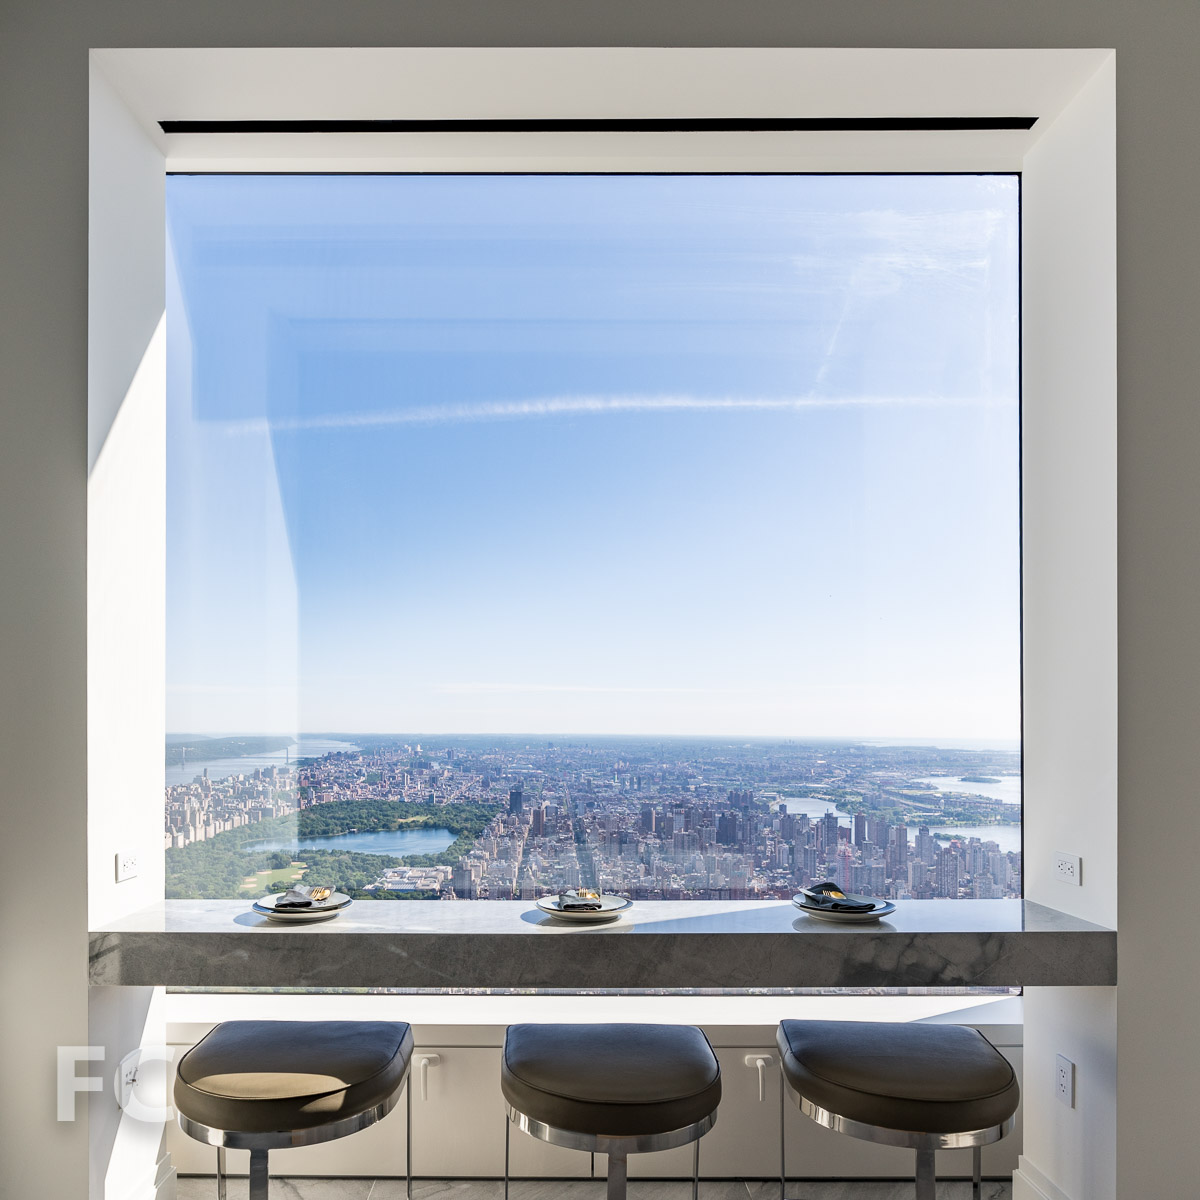 Kitchen window facing north toward Central Park and northern Manhattan.